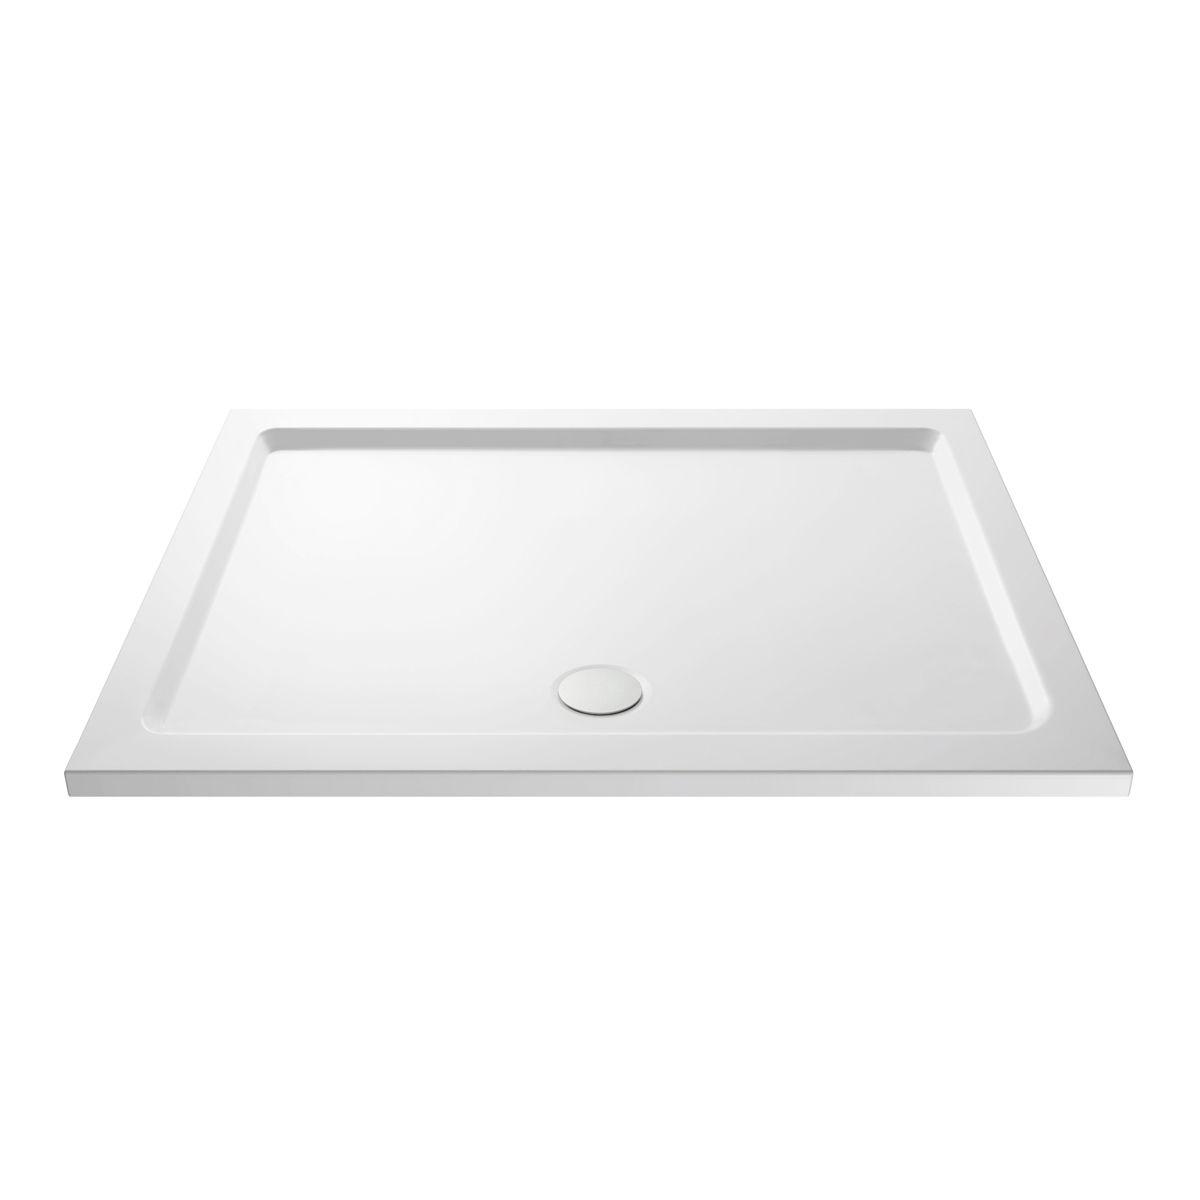 Cassellie Rectangular Shower Tray 1700 x 900mm